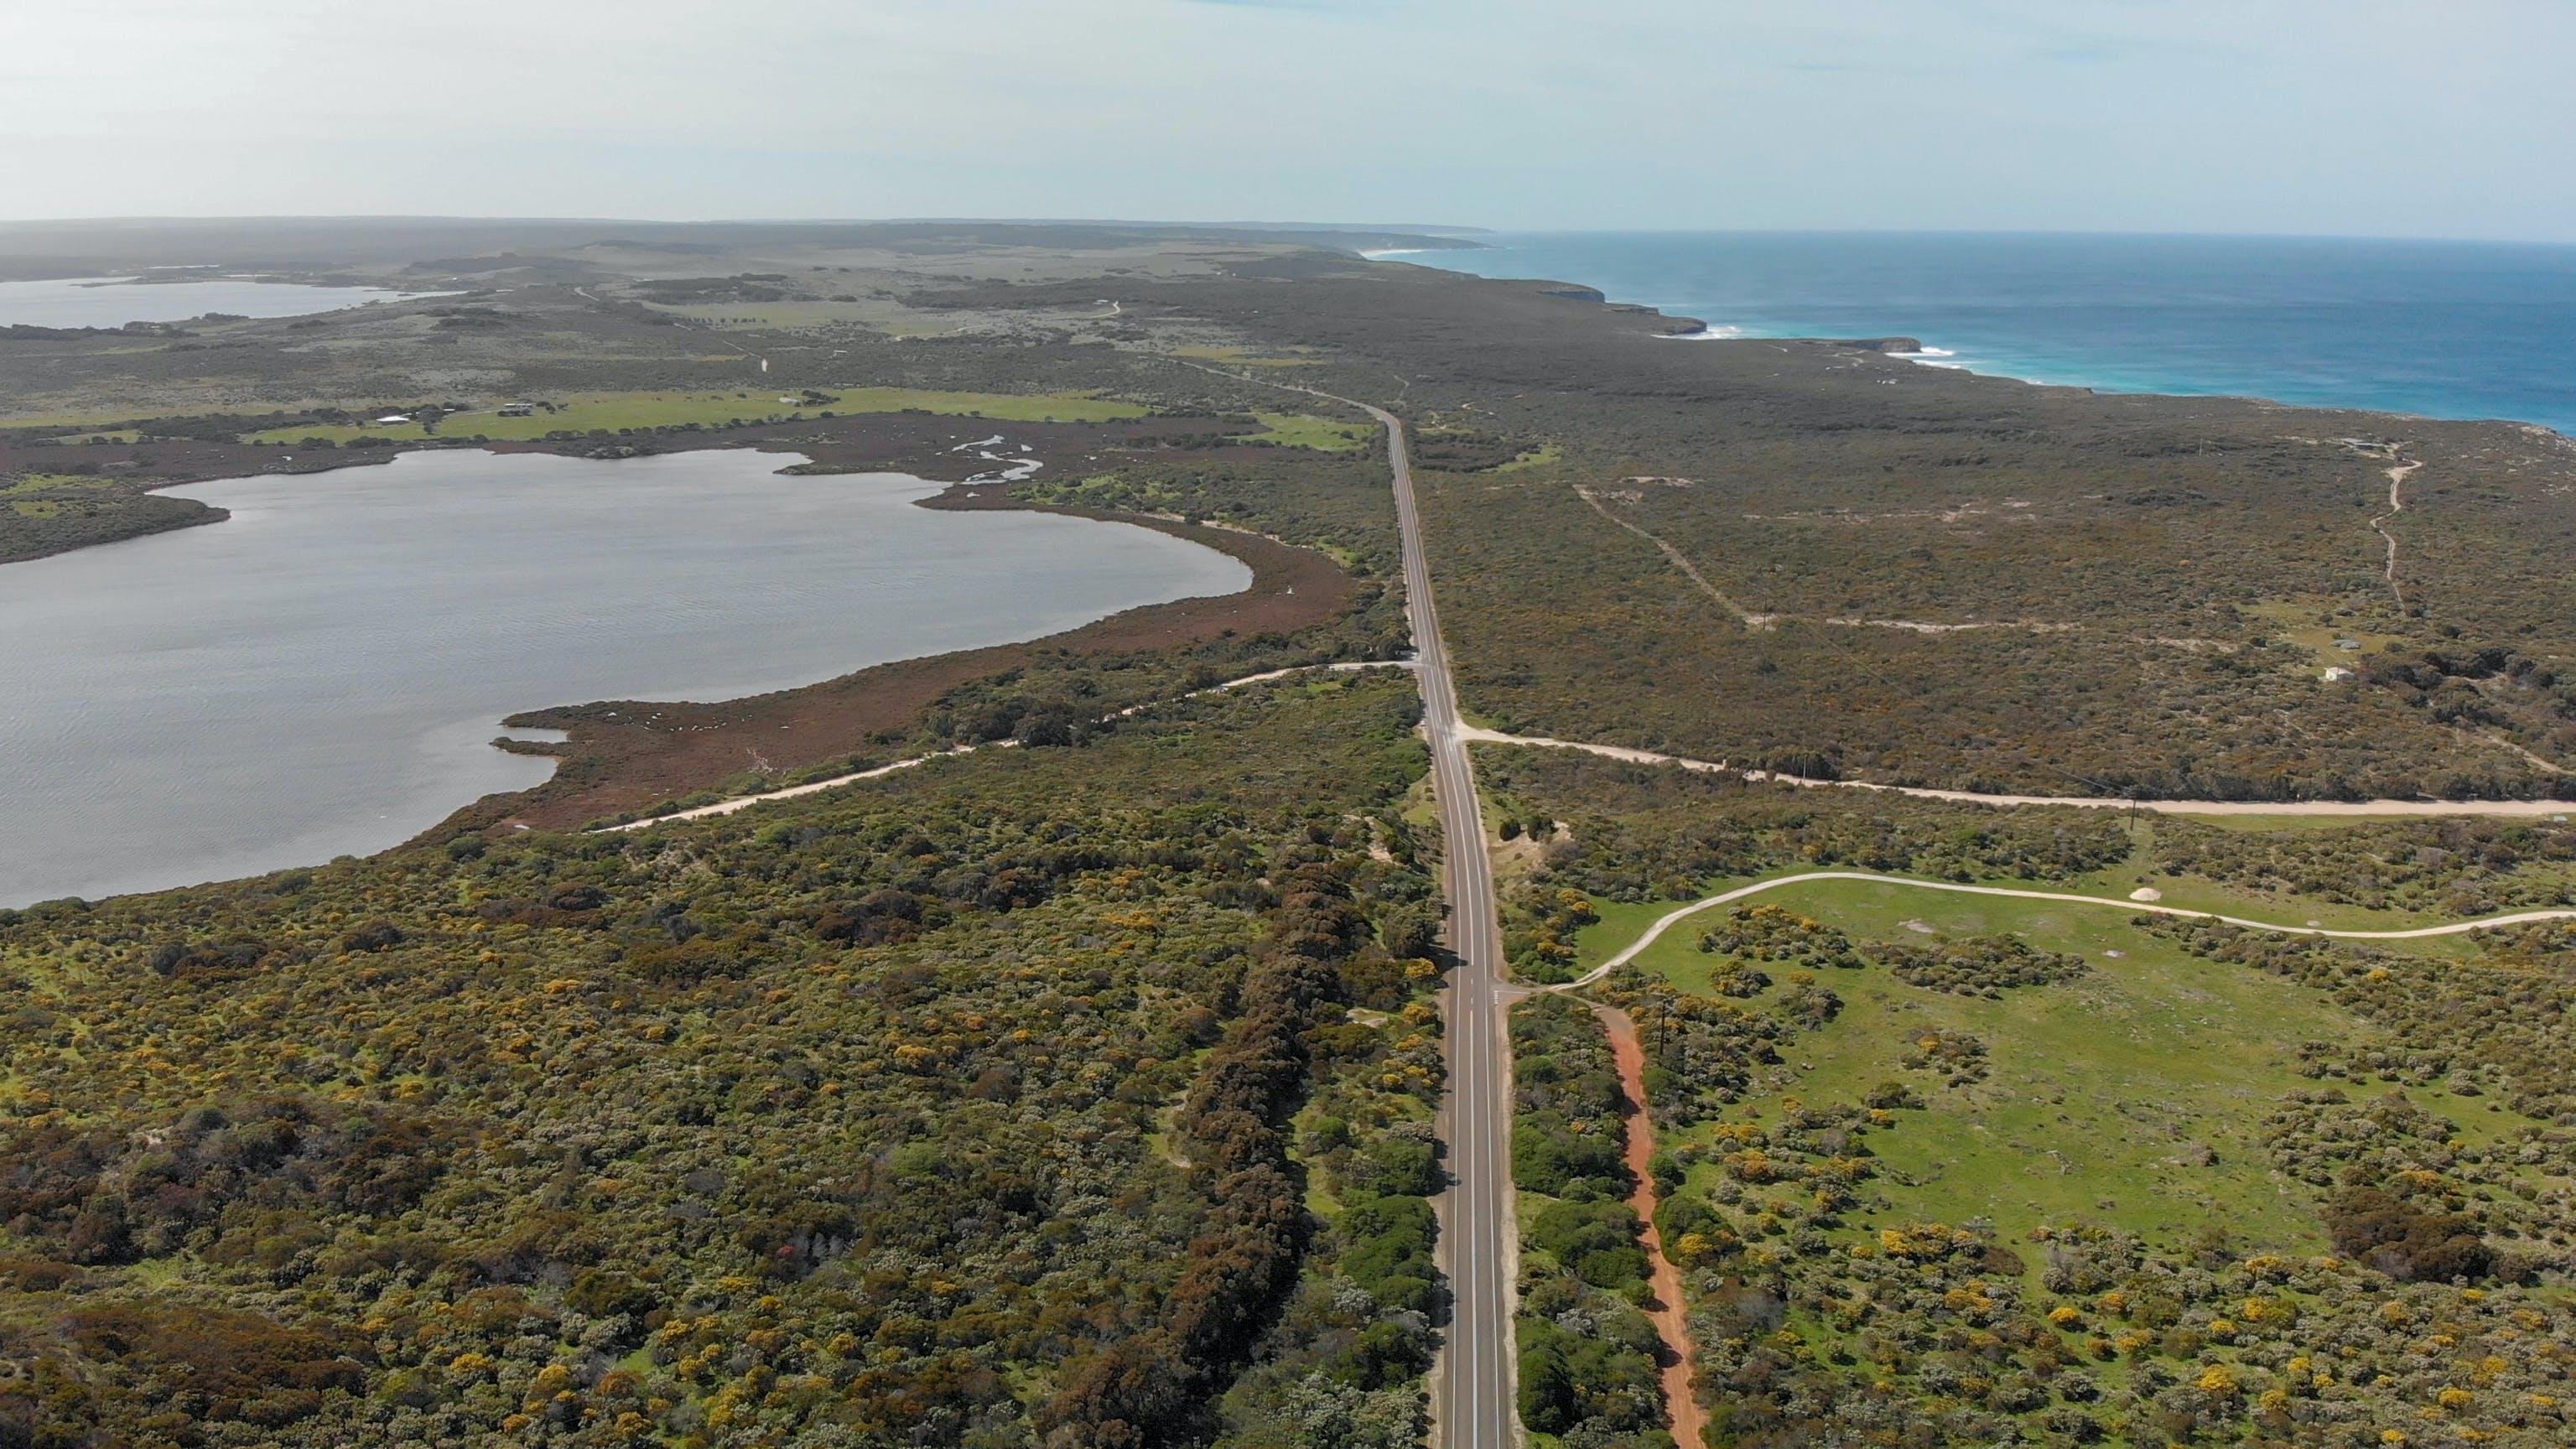 View looking east over Pelican Lagoon